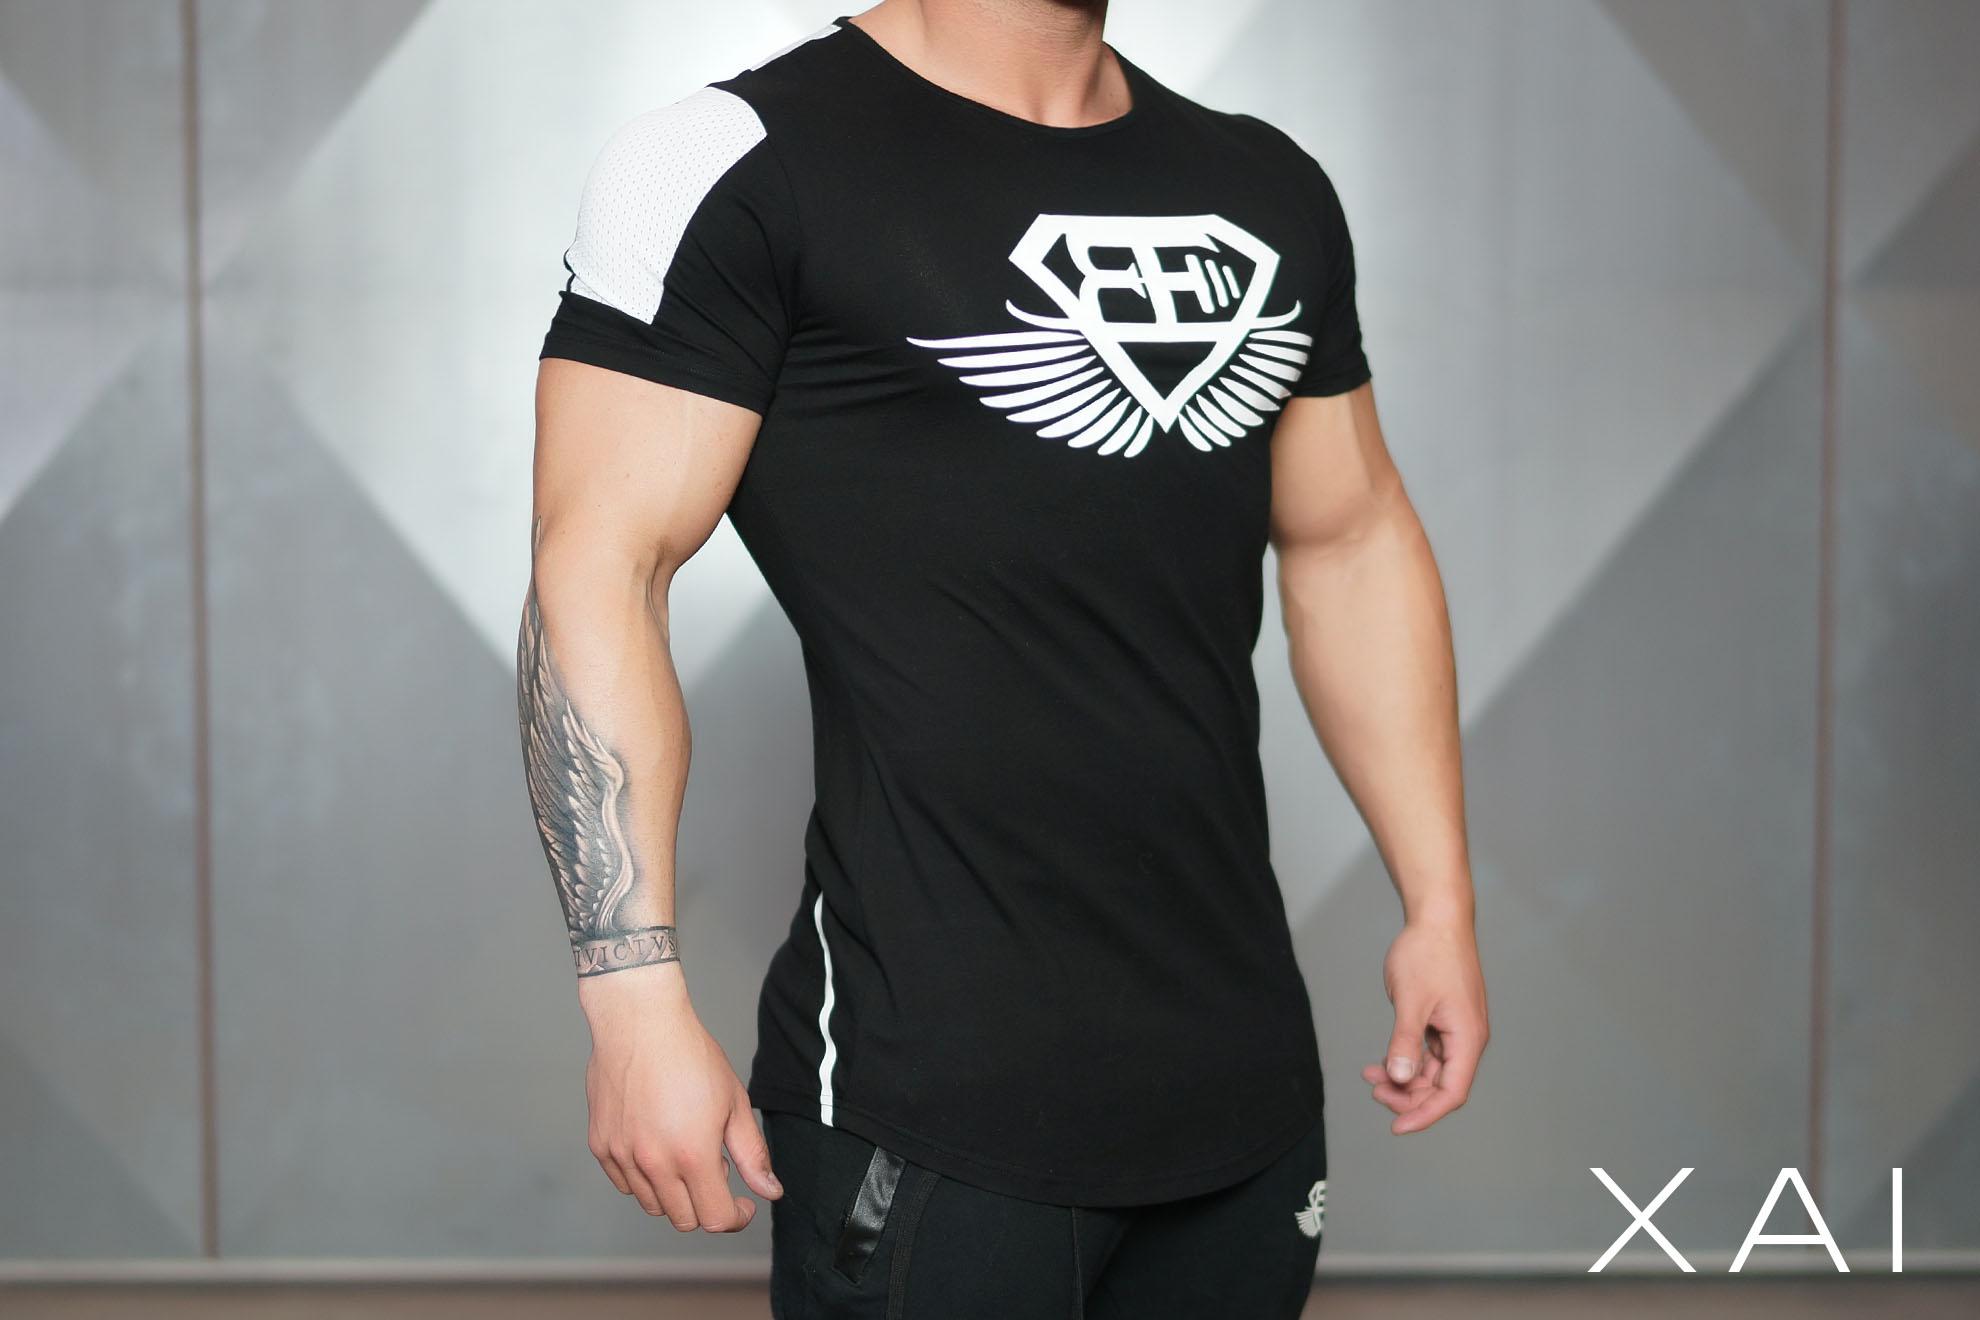 XA1 T shirt VINDICT – Black Out – Body Engineers International SHOP